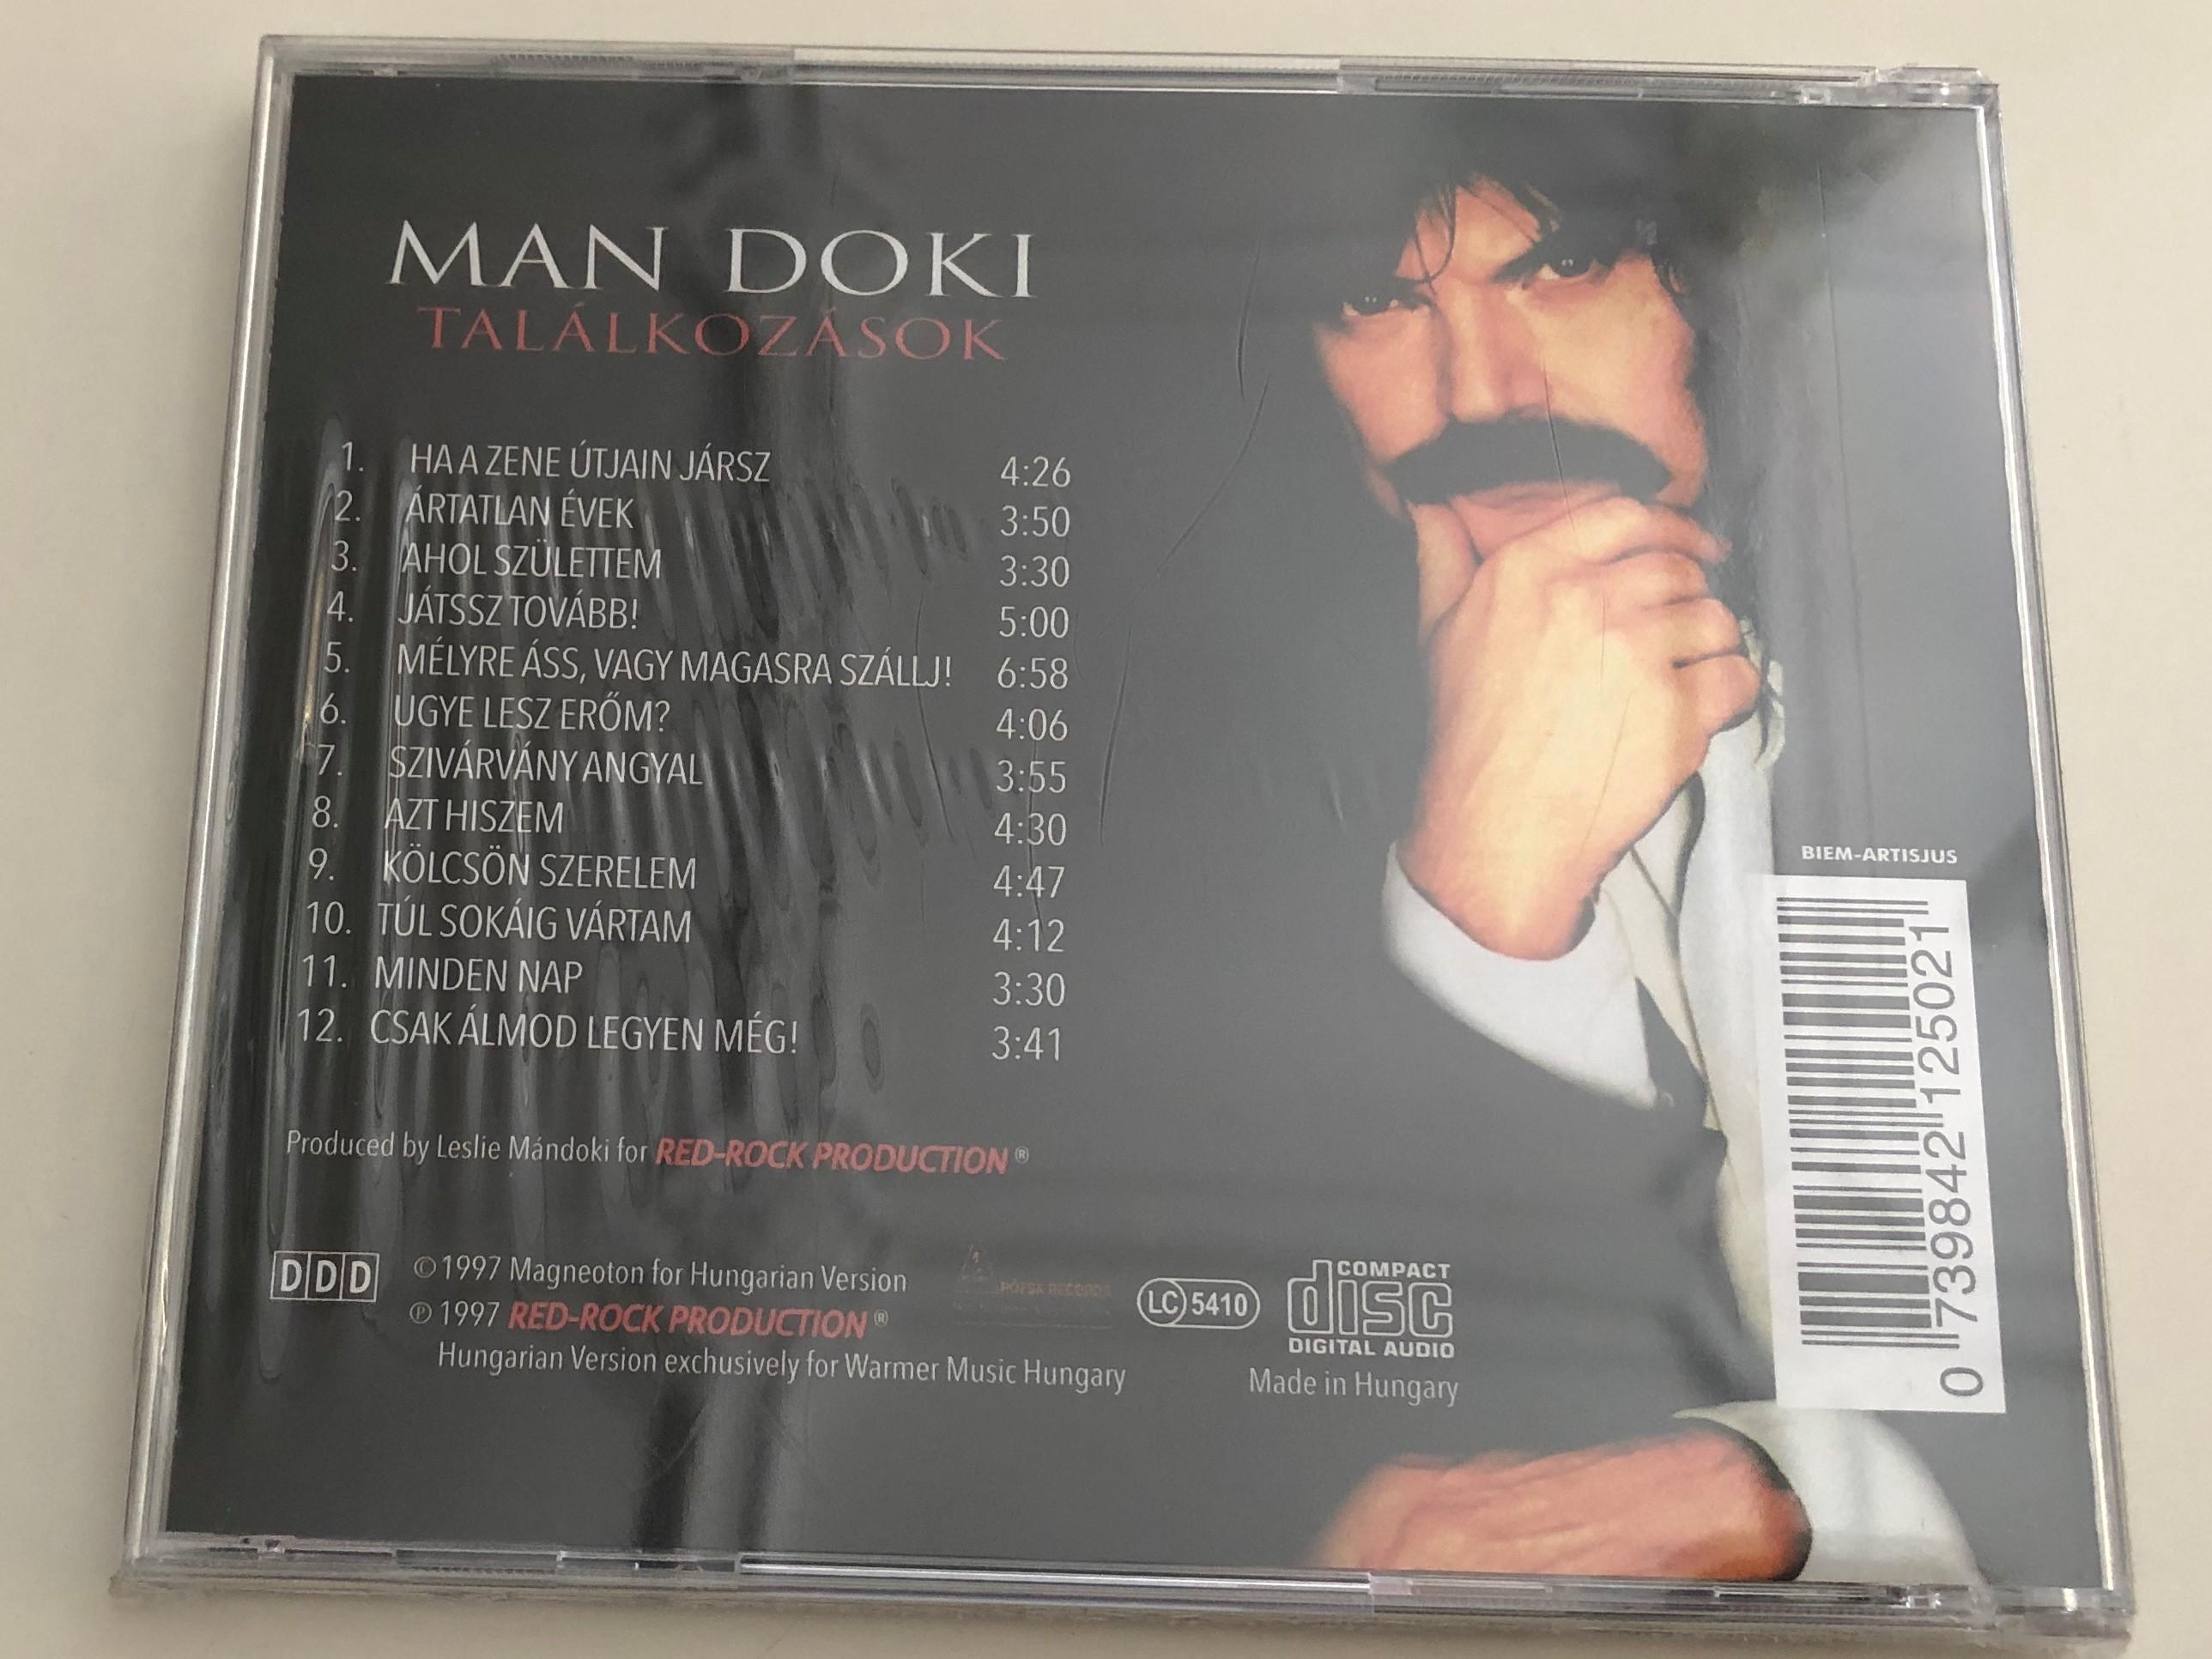 man-doki-charlie-demj-n-ferenc-zor-n-soml-tam-s-cserh-ti-zsuzsa-tal-lkoz-sok-magneoton-audio-cd-1997-3984-21250-2-3-.jpg